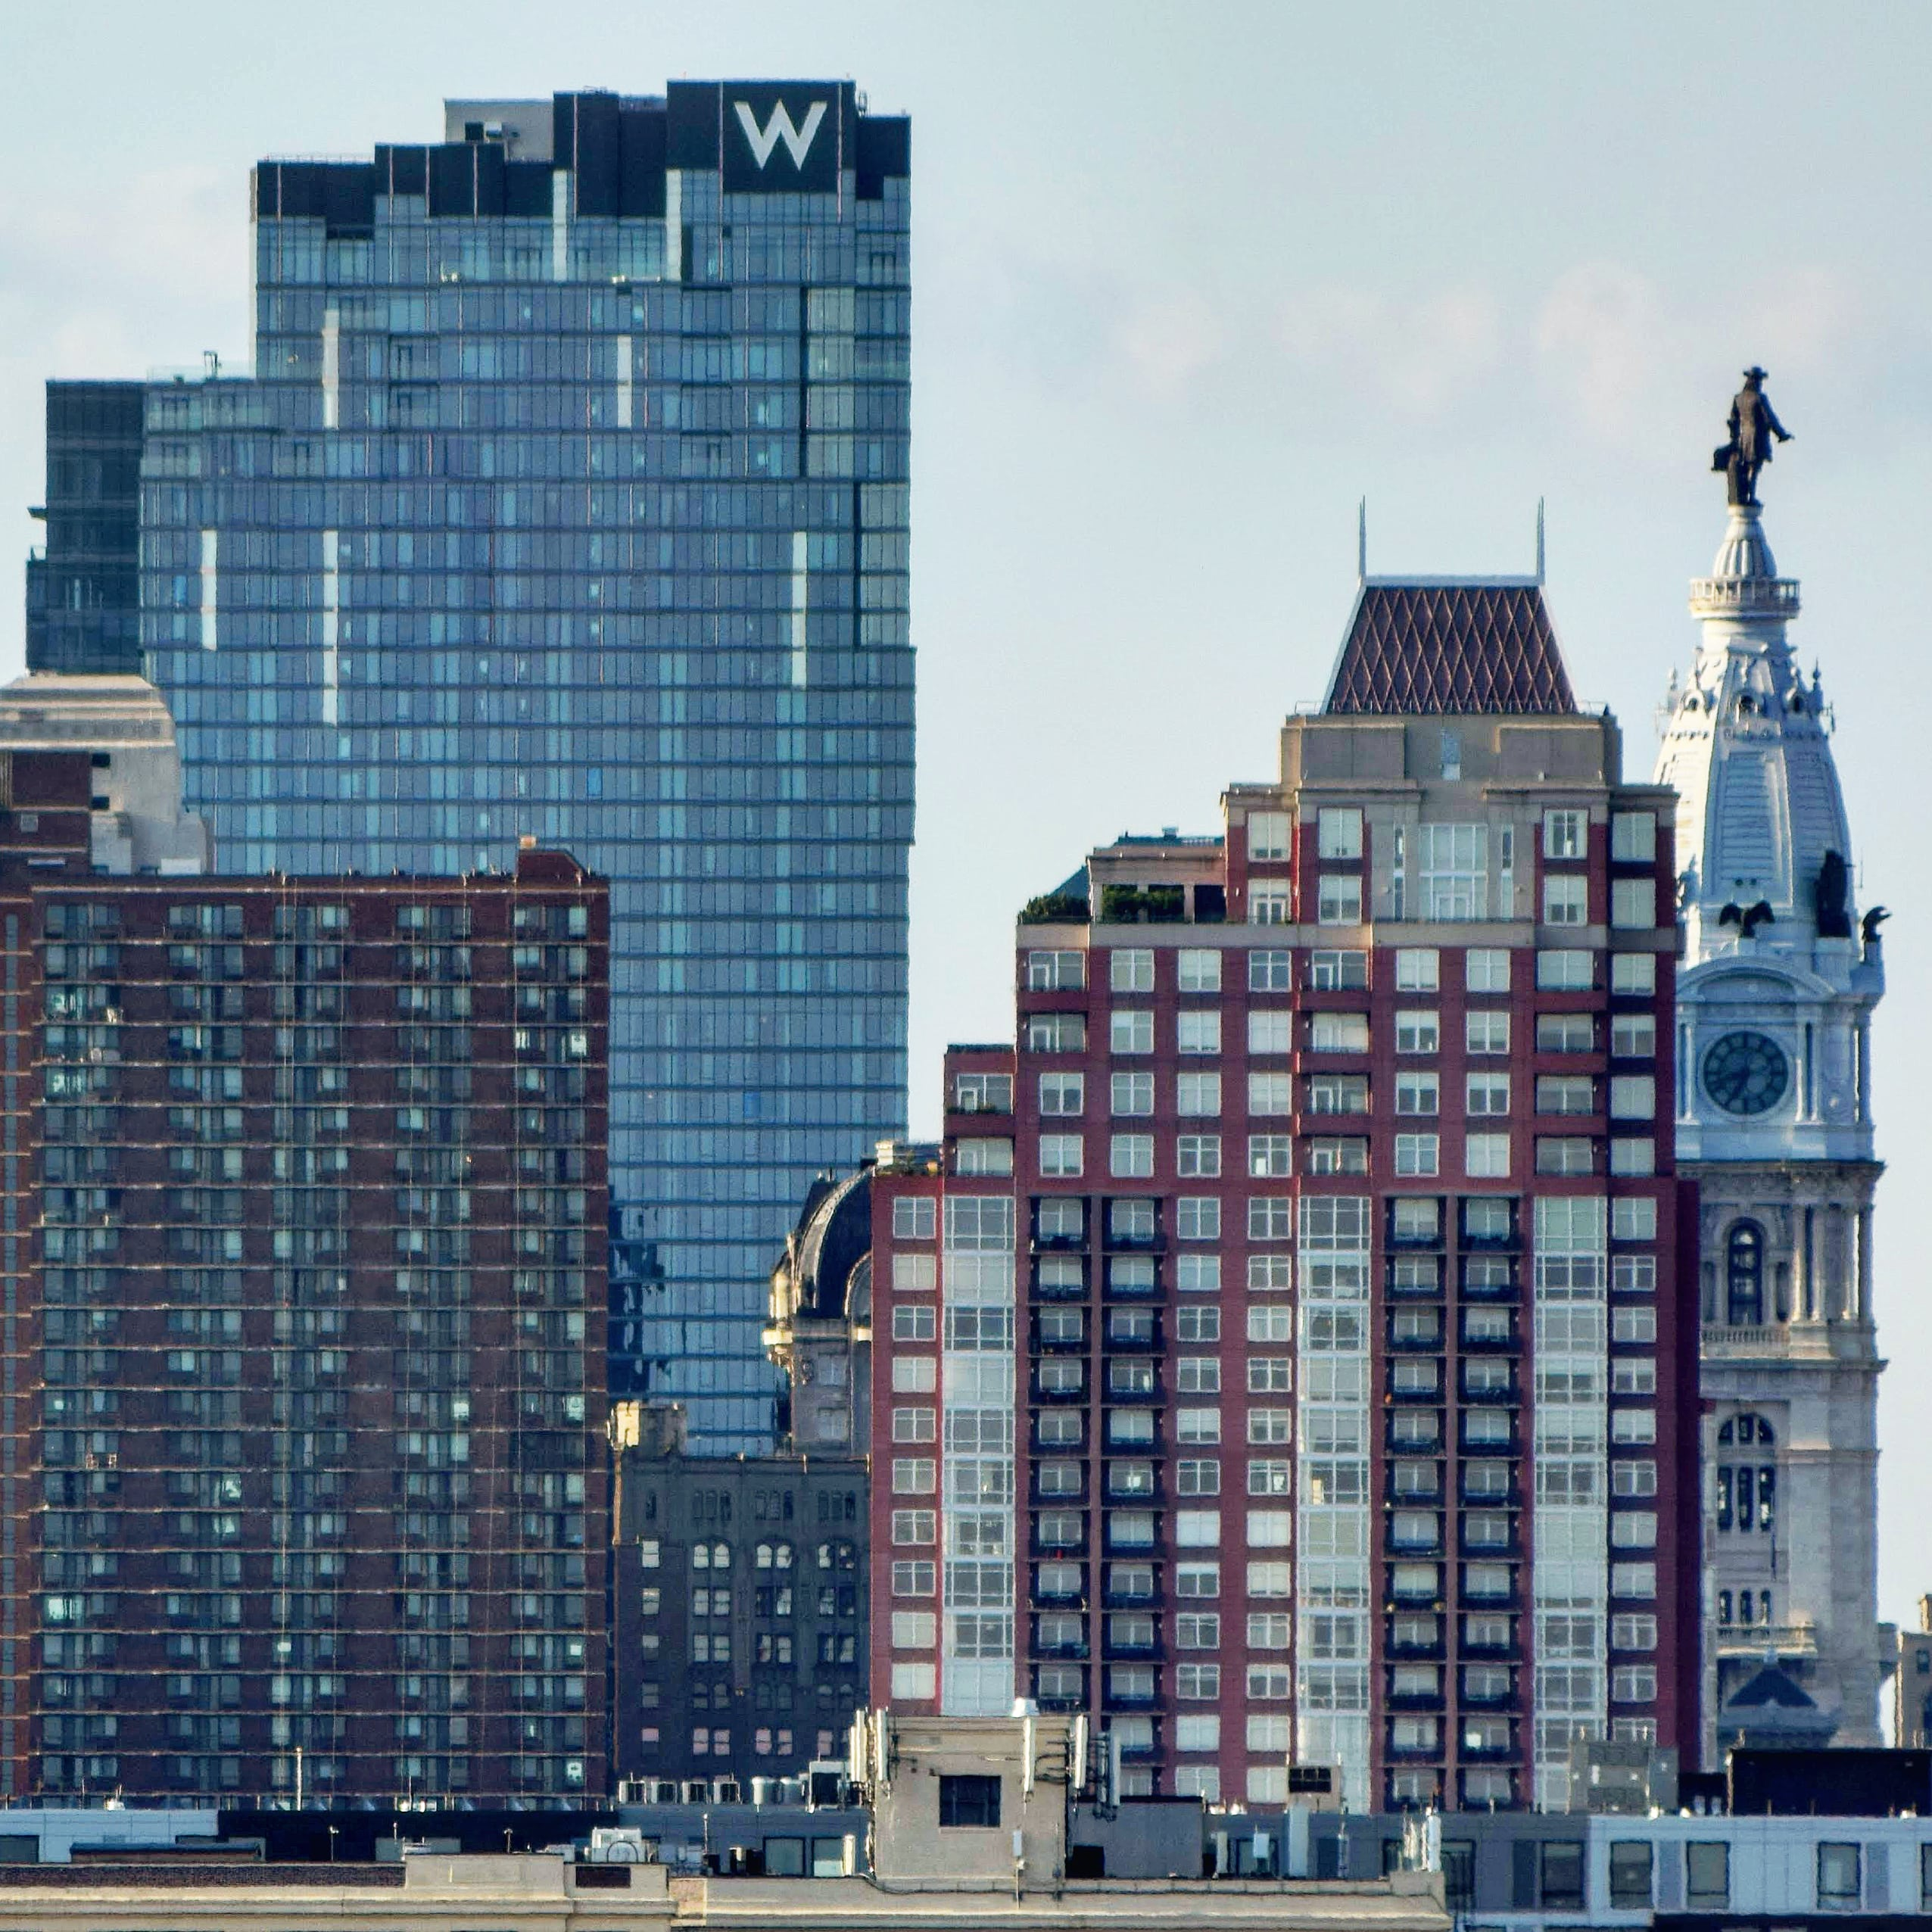 W/Element Hotel from City Hall. Photo by Thomas Koloski